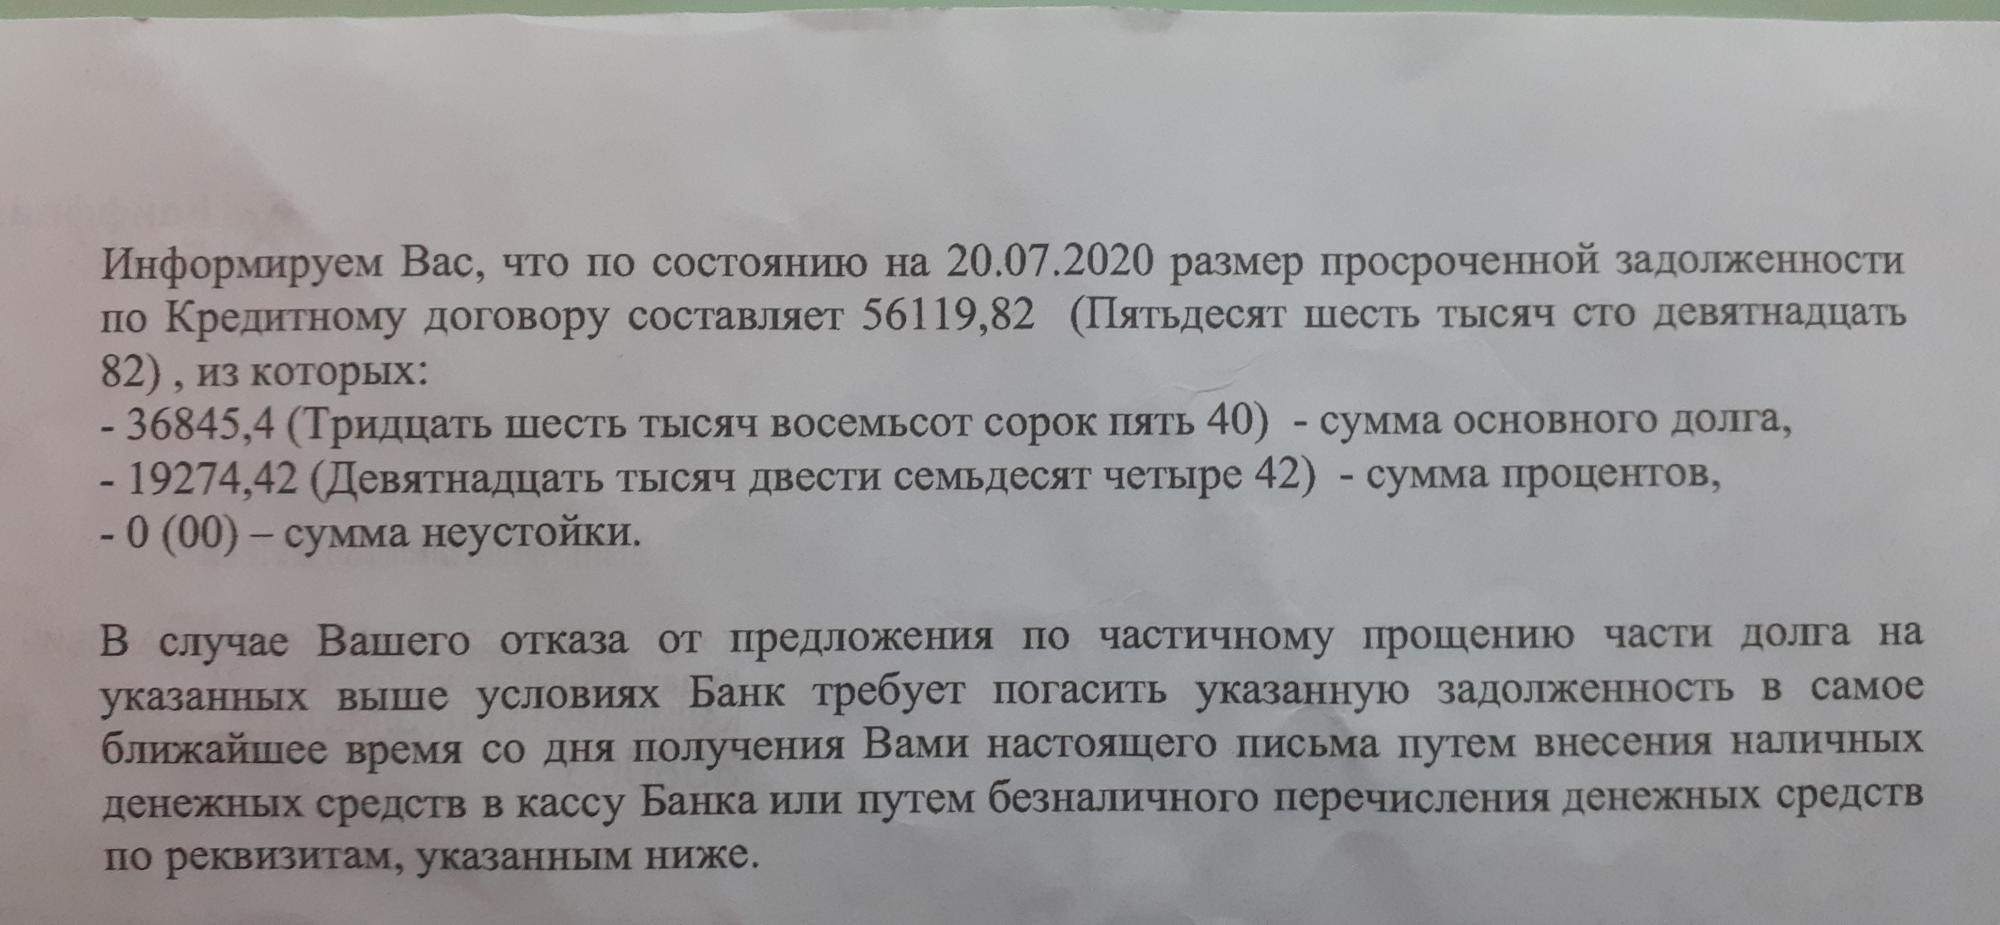 претензия 2020.jpg